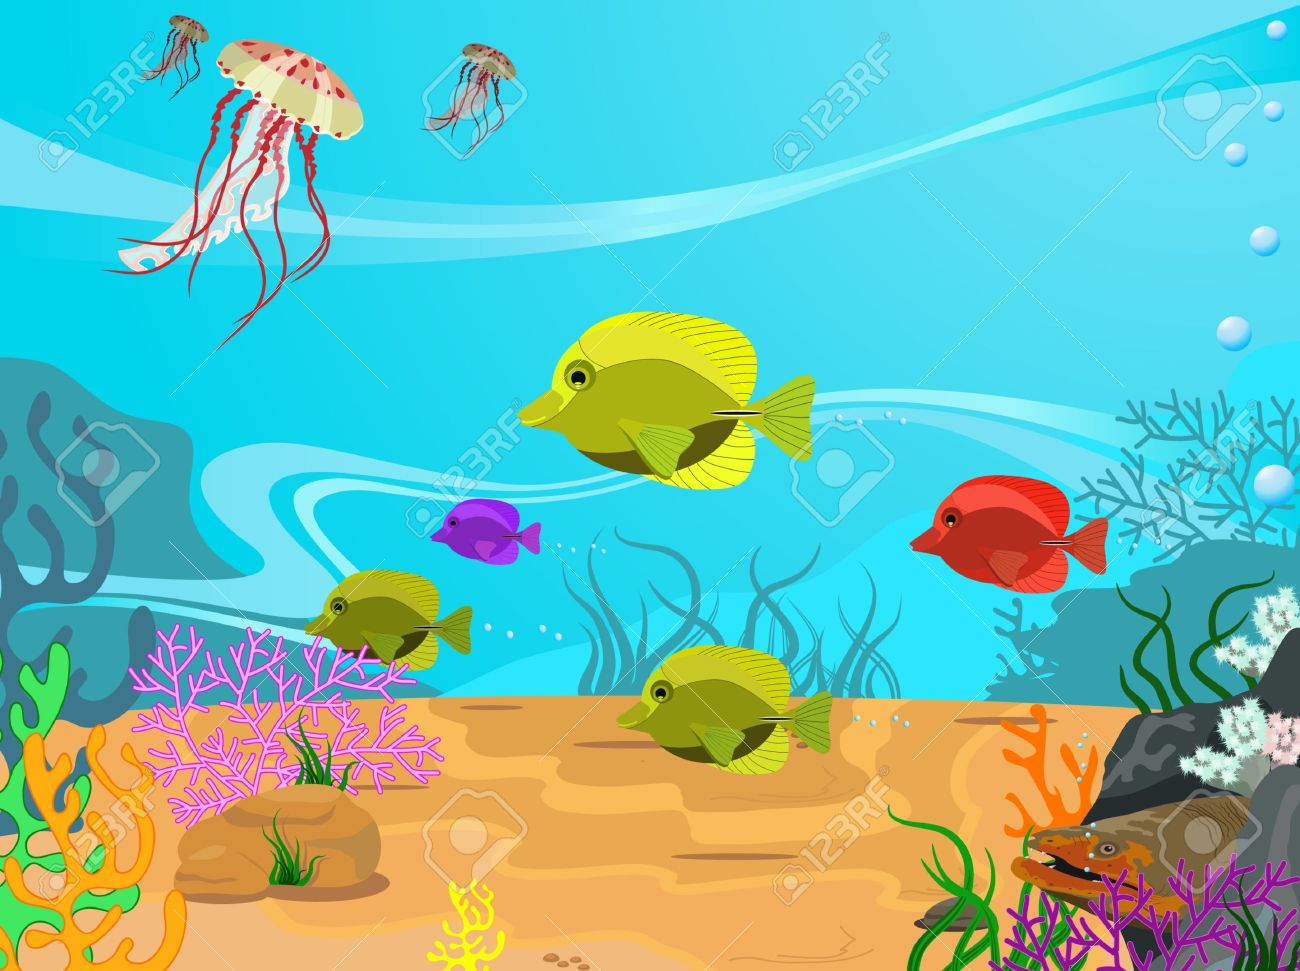 Cute Algae Wallpaper Seabed Clipart Clipground